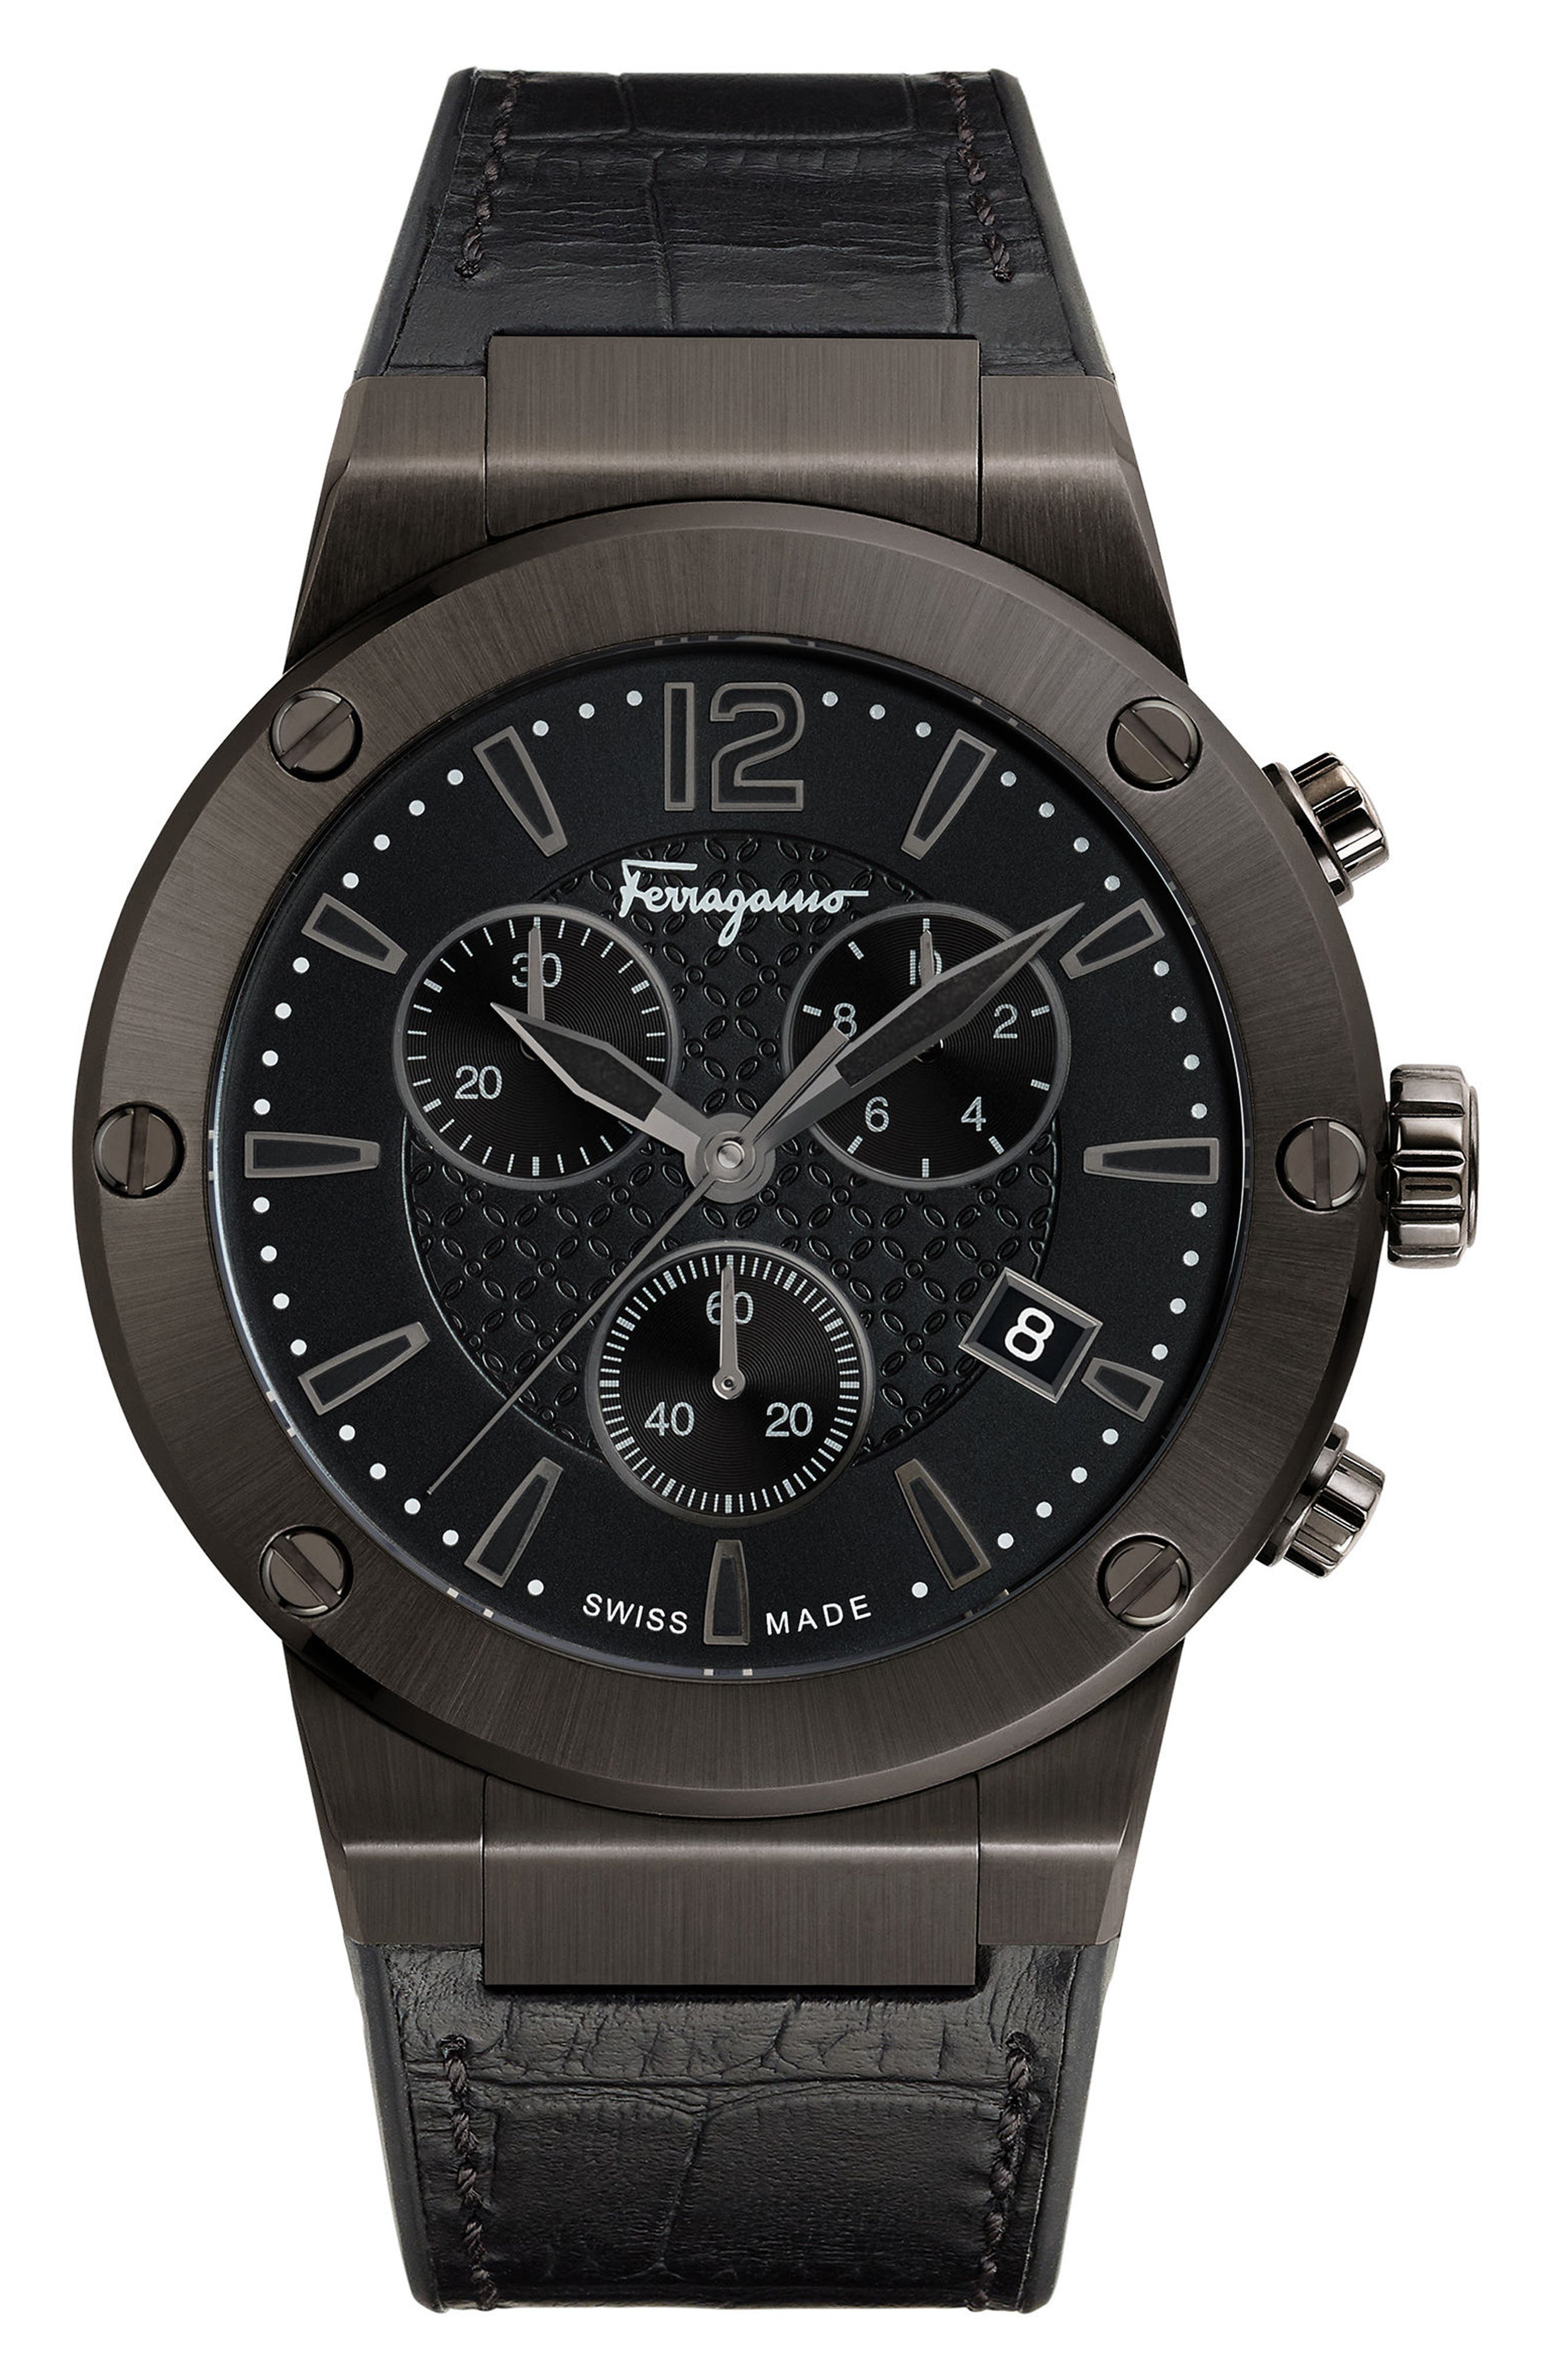 Main Image - Salvatore Ferragamo F80 Chronograph Leather Strap Watch, 44mm